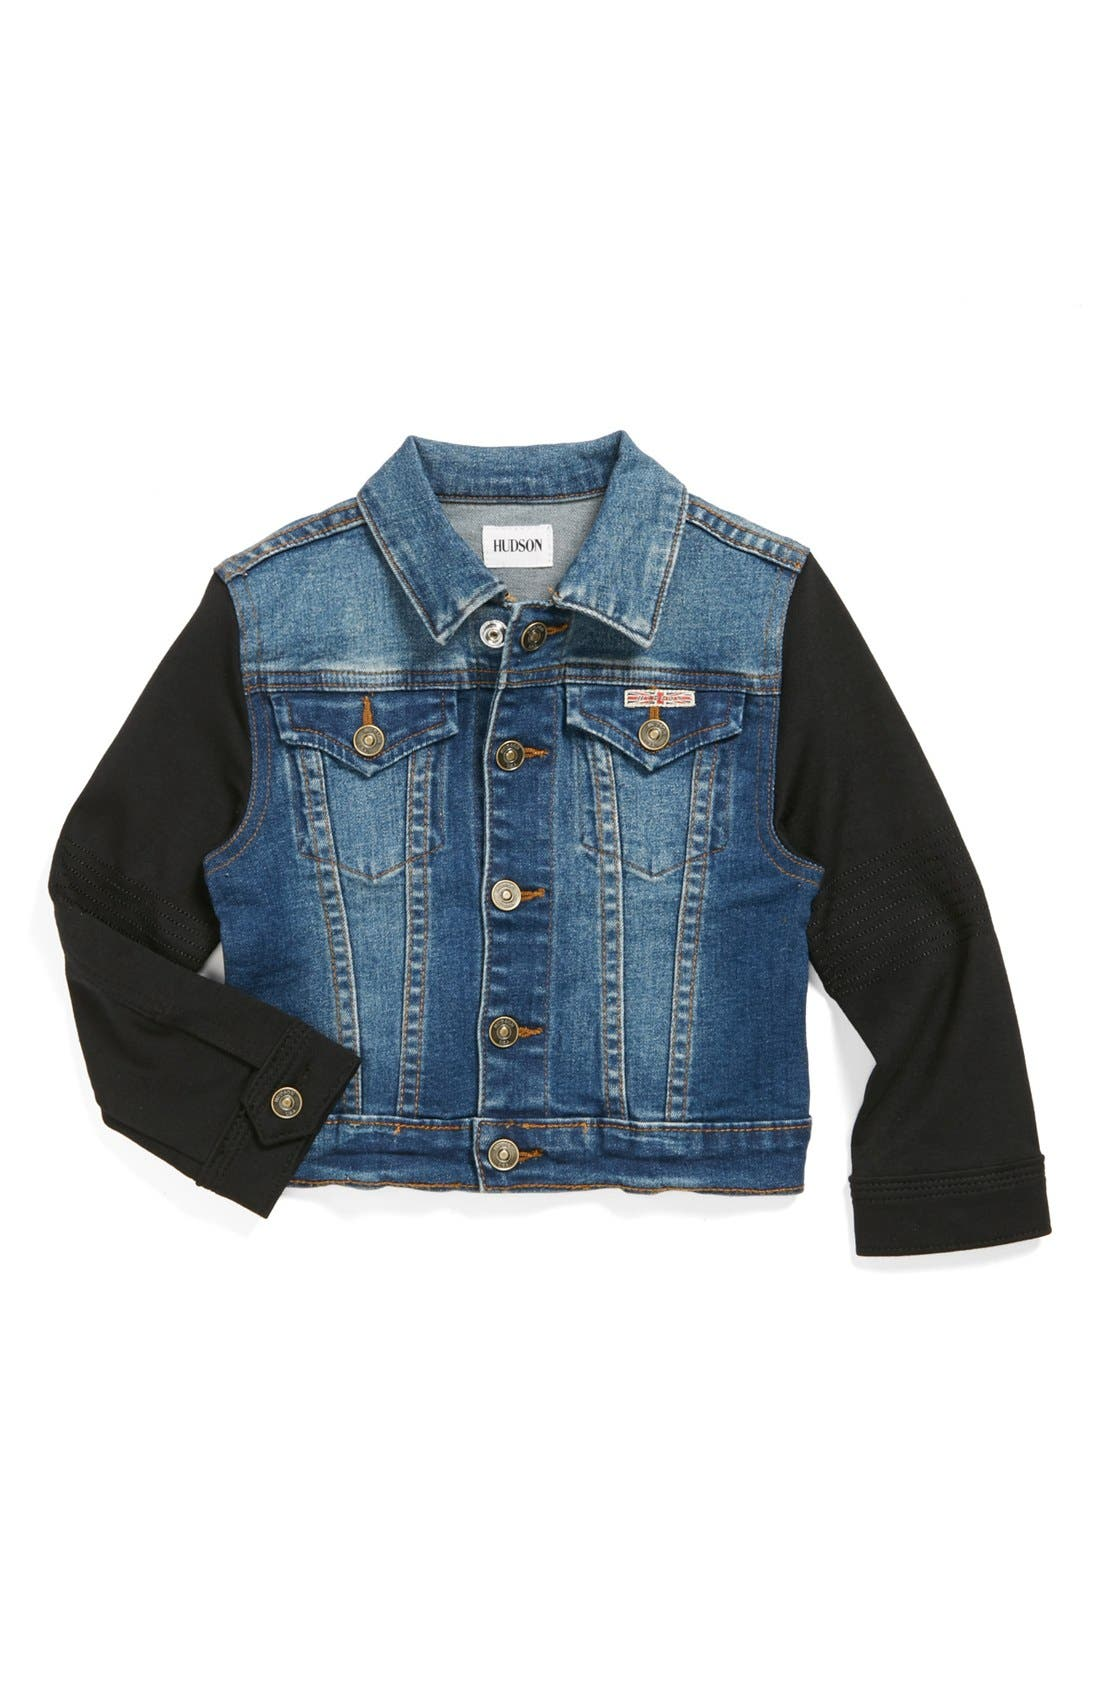 Alternate Image 1 Selected - Hudson Kids Denim Jacket (Toddler Girls)